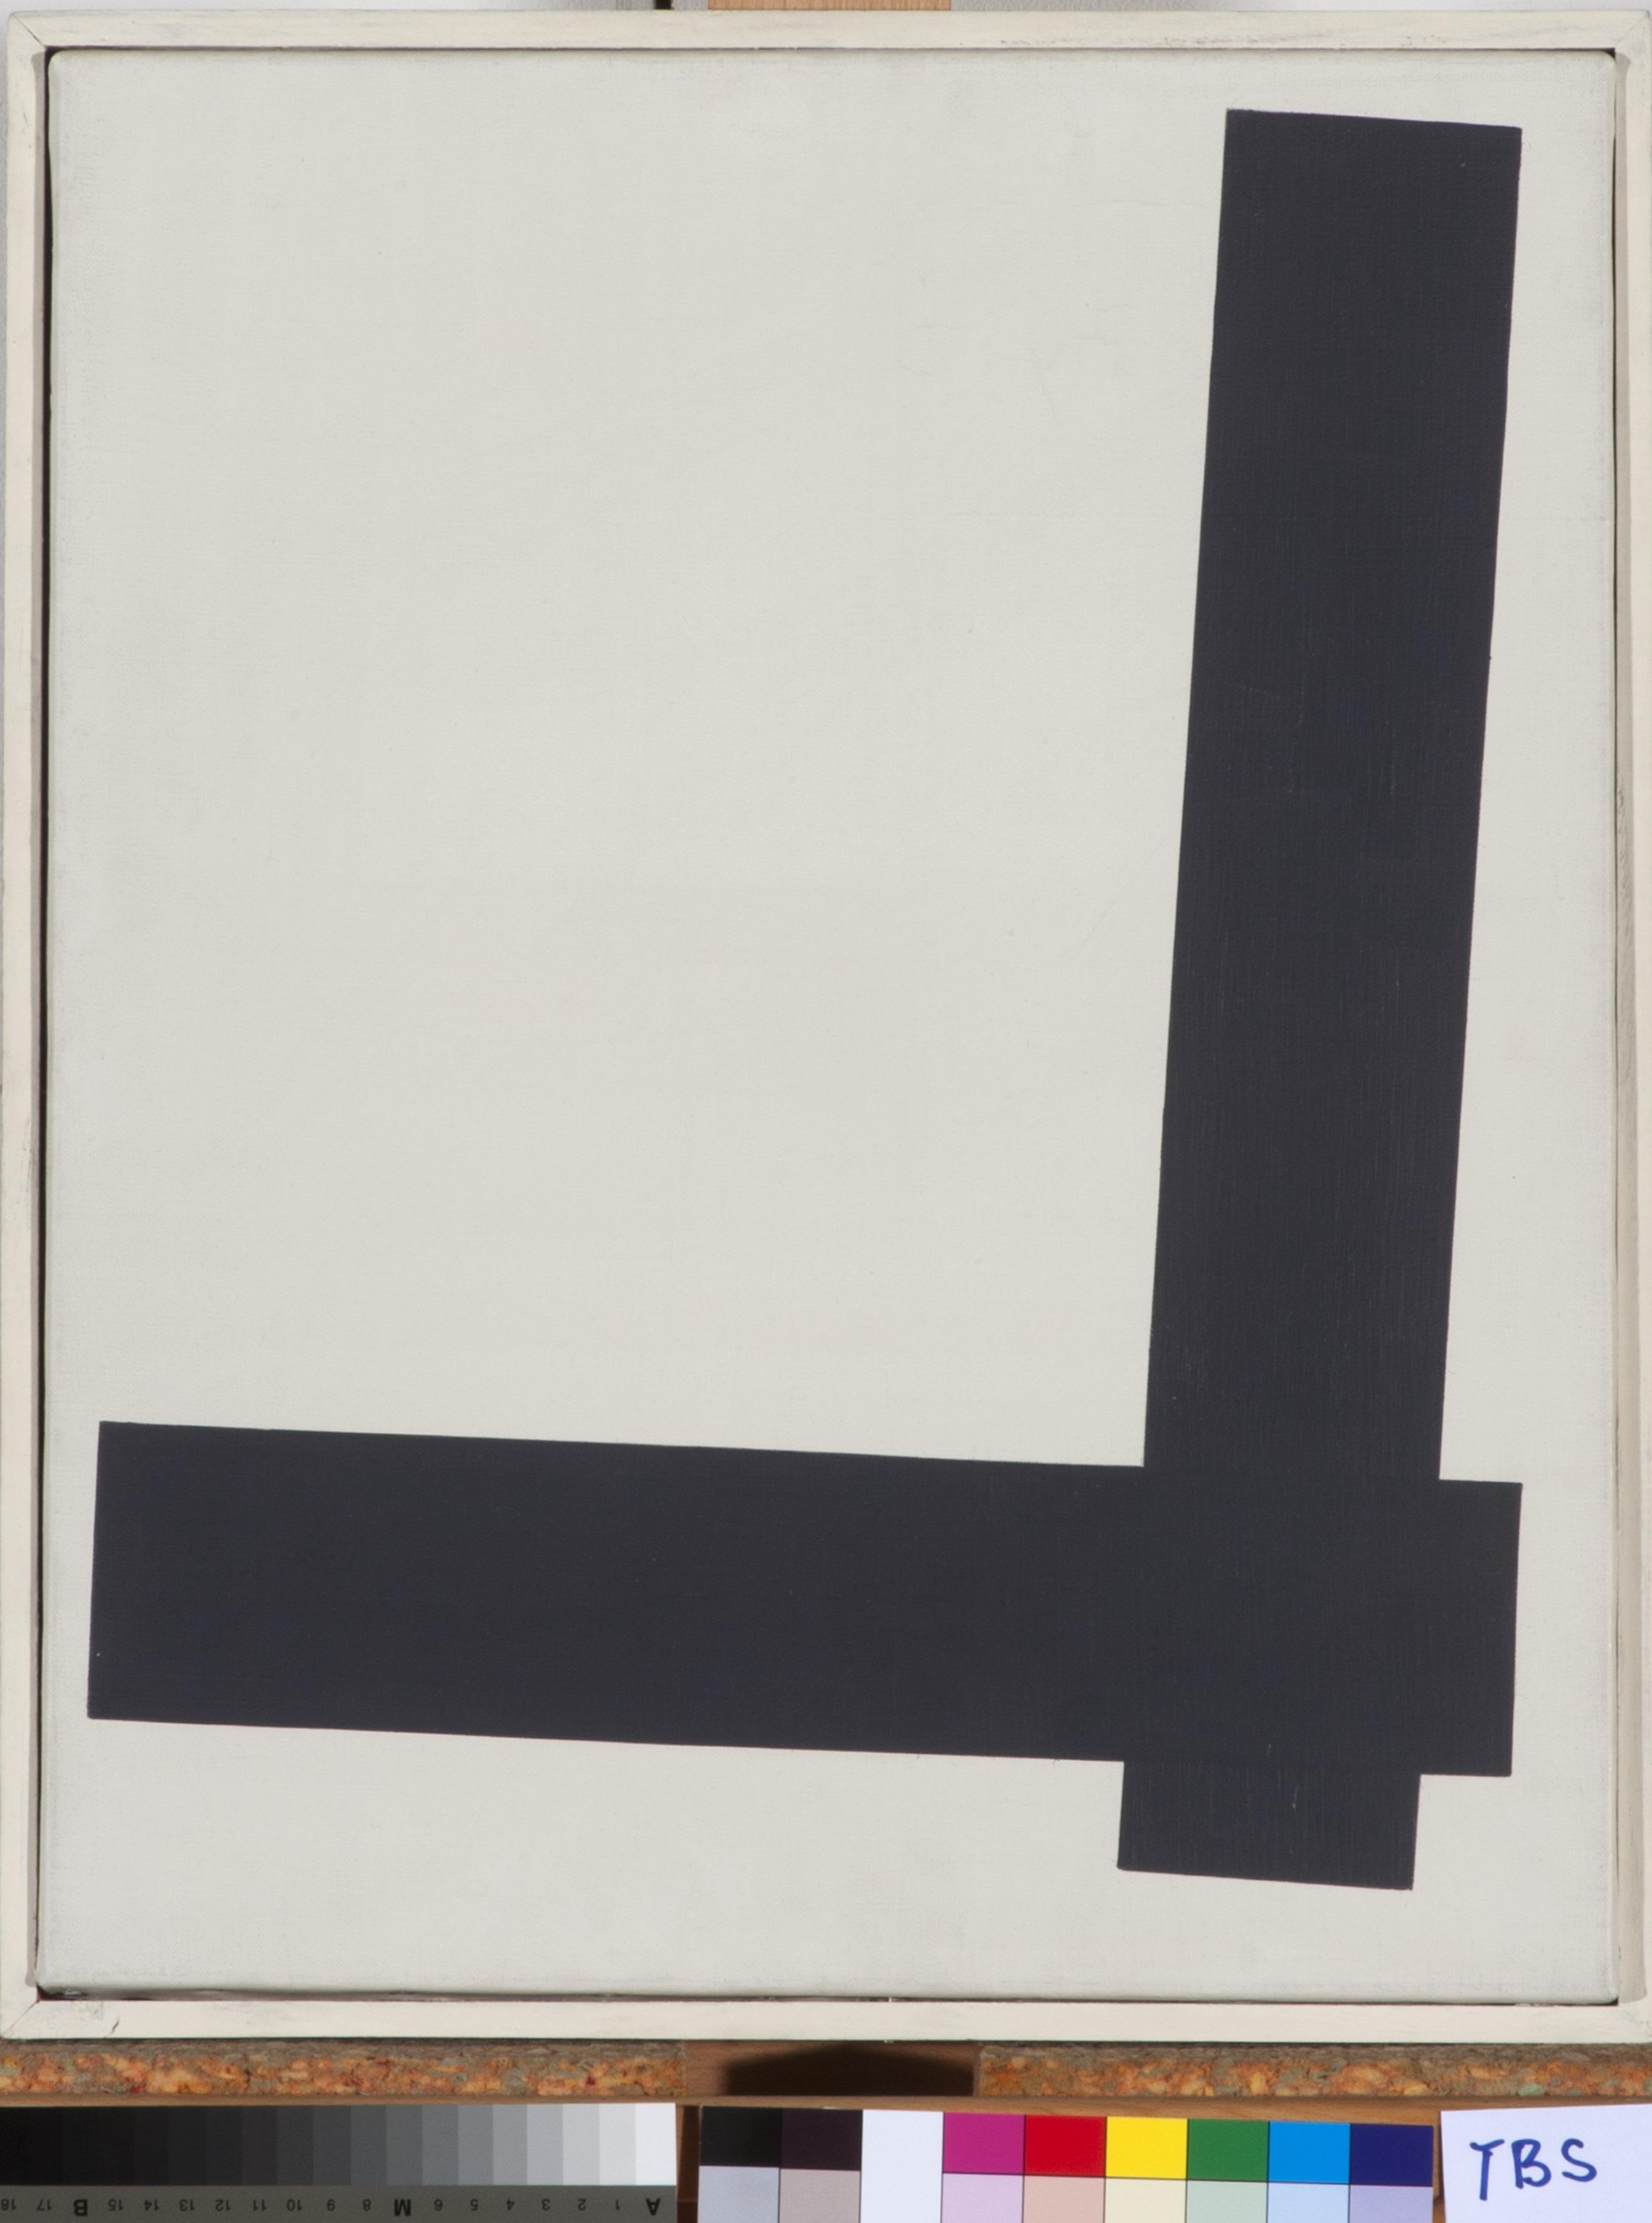 Theodor Bally, Stabkomposition (Nr. 8), 1963, Öl auf Leinwand